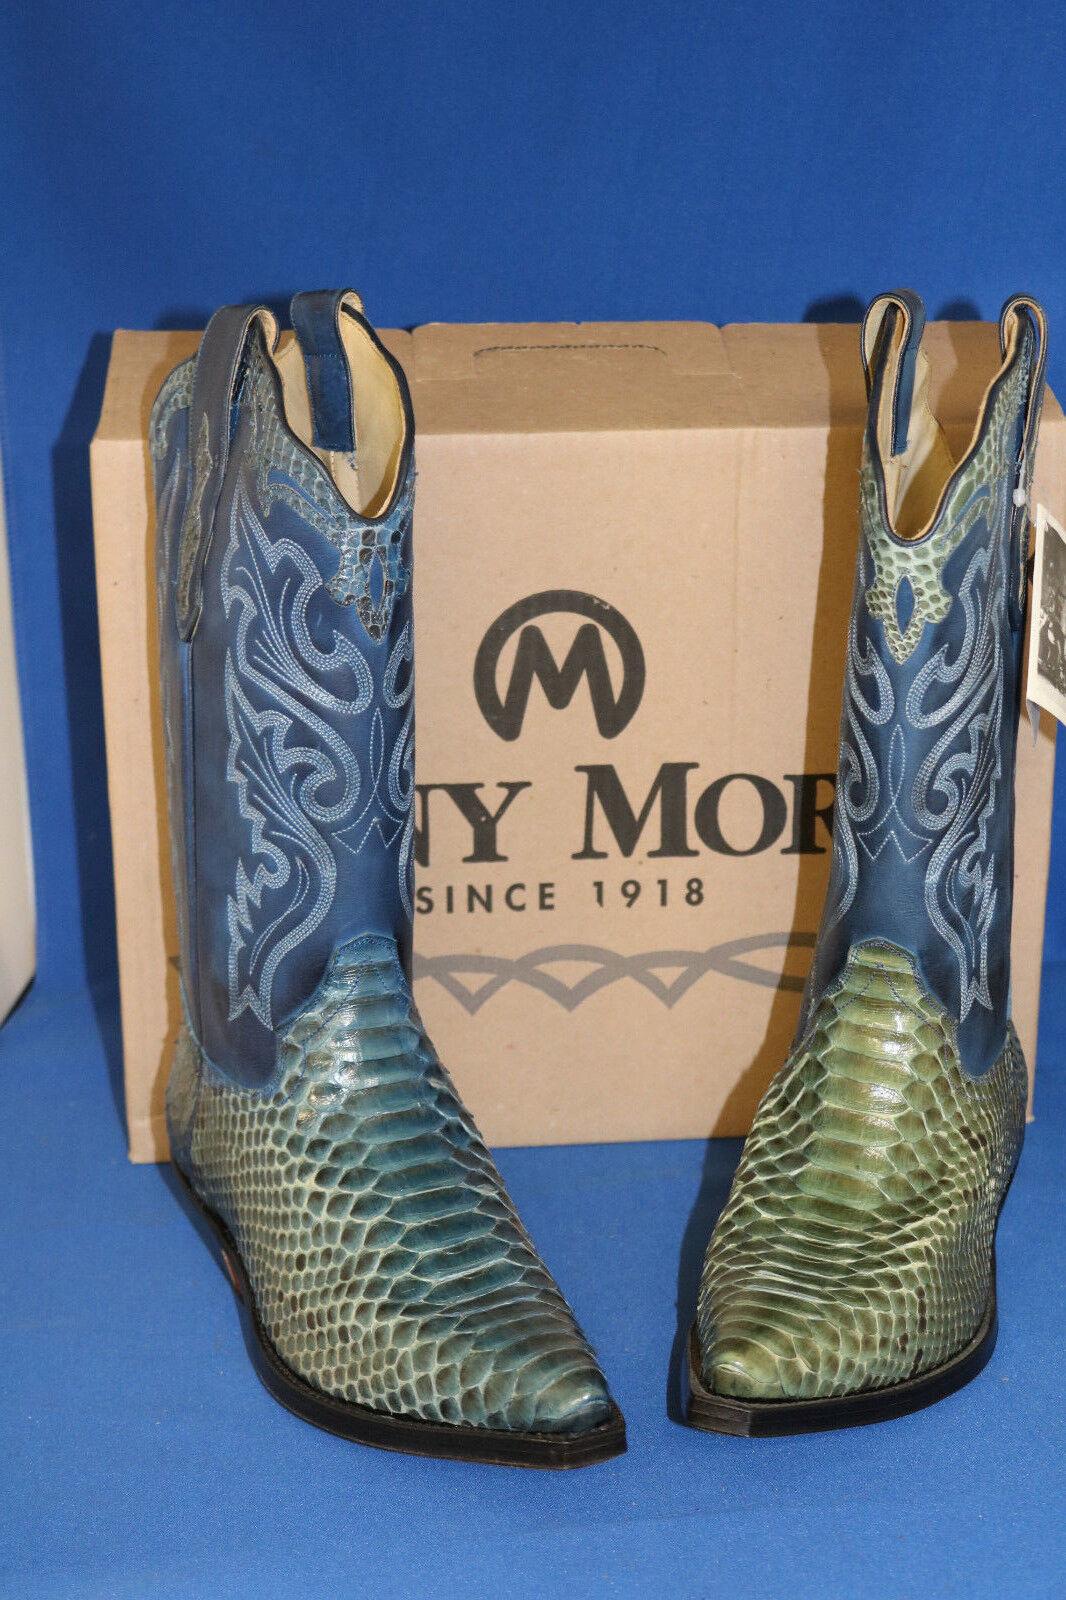 Tony mora botas botas vaqueras botas de vaquero botas Pyton azul nuevo talla. 42